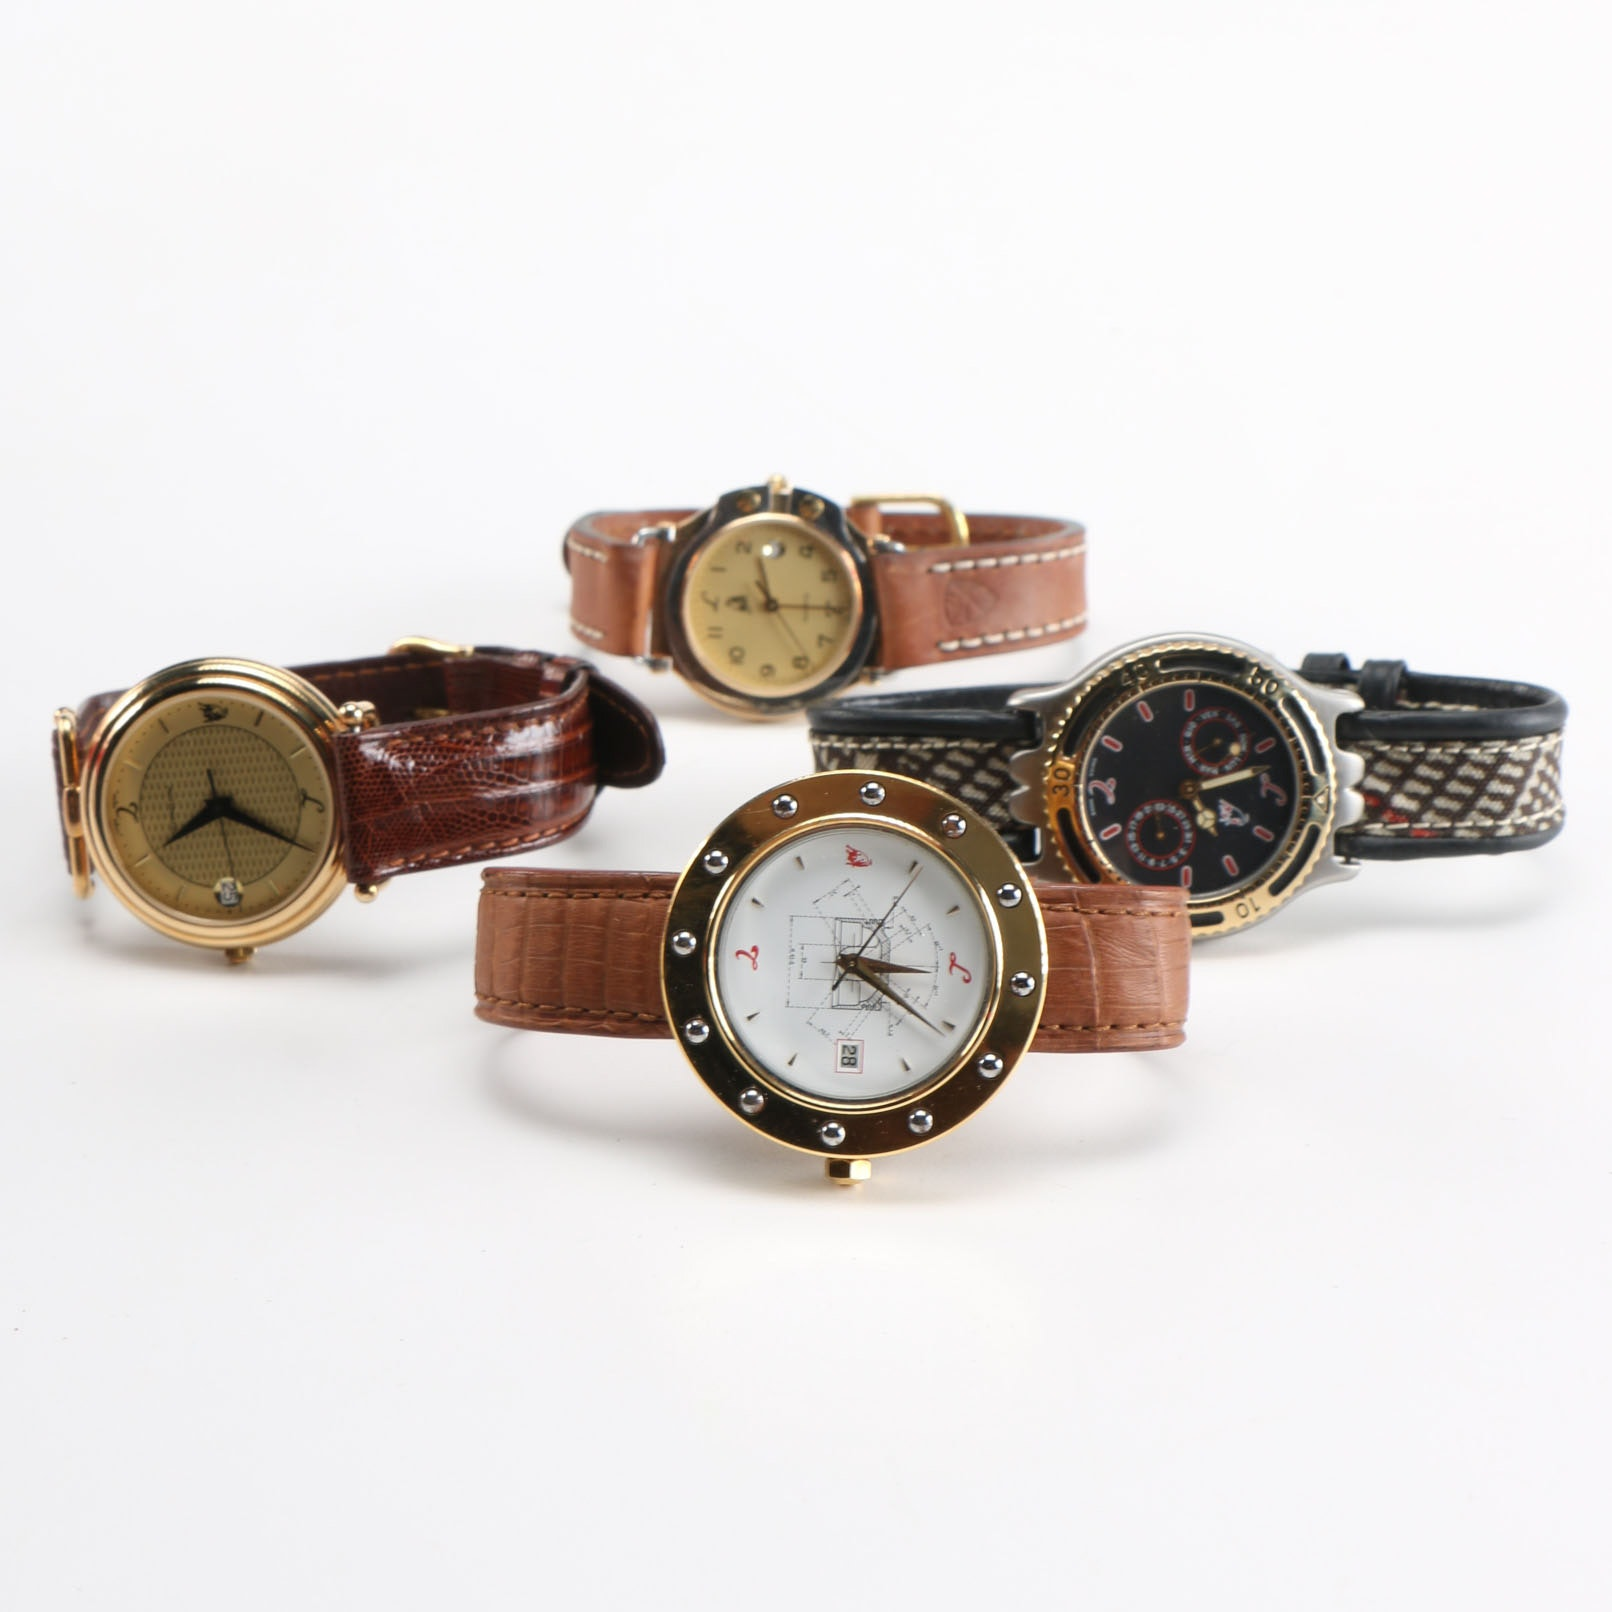 Men's Tonino Lamborghini Wristwatches